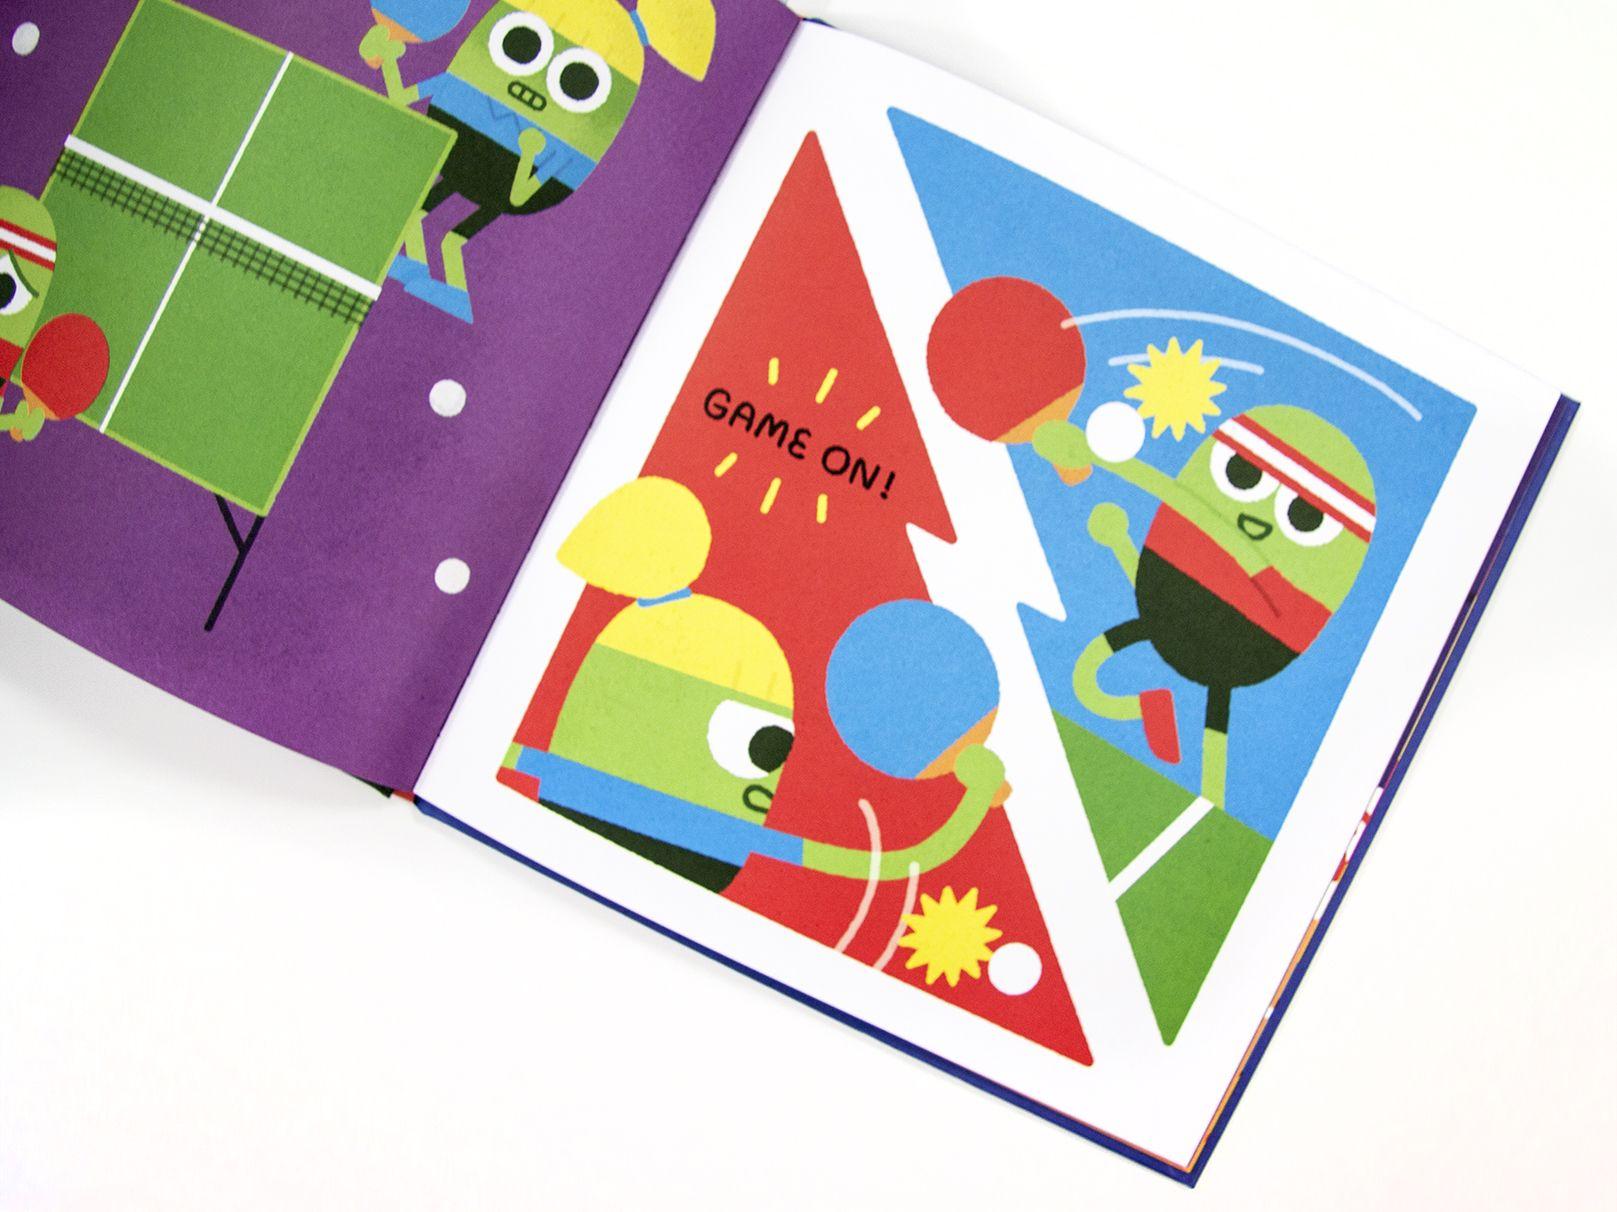 Flying Eye Books Ping vs Pong Pong, Tennis champion, Ping